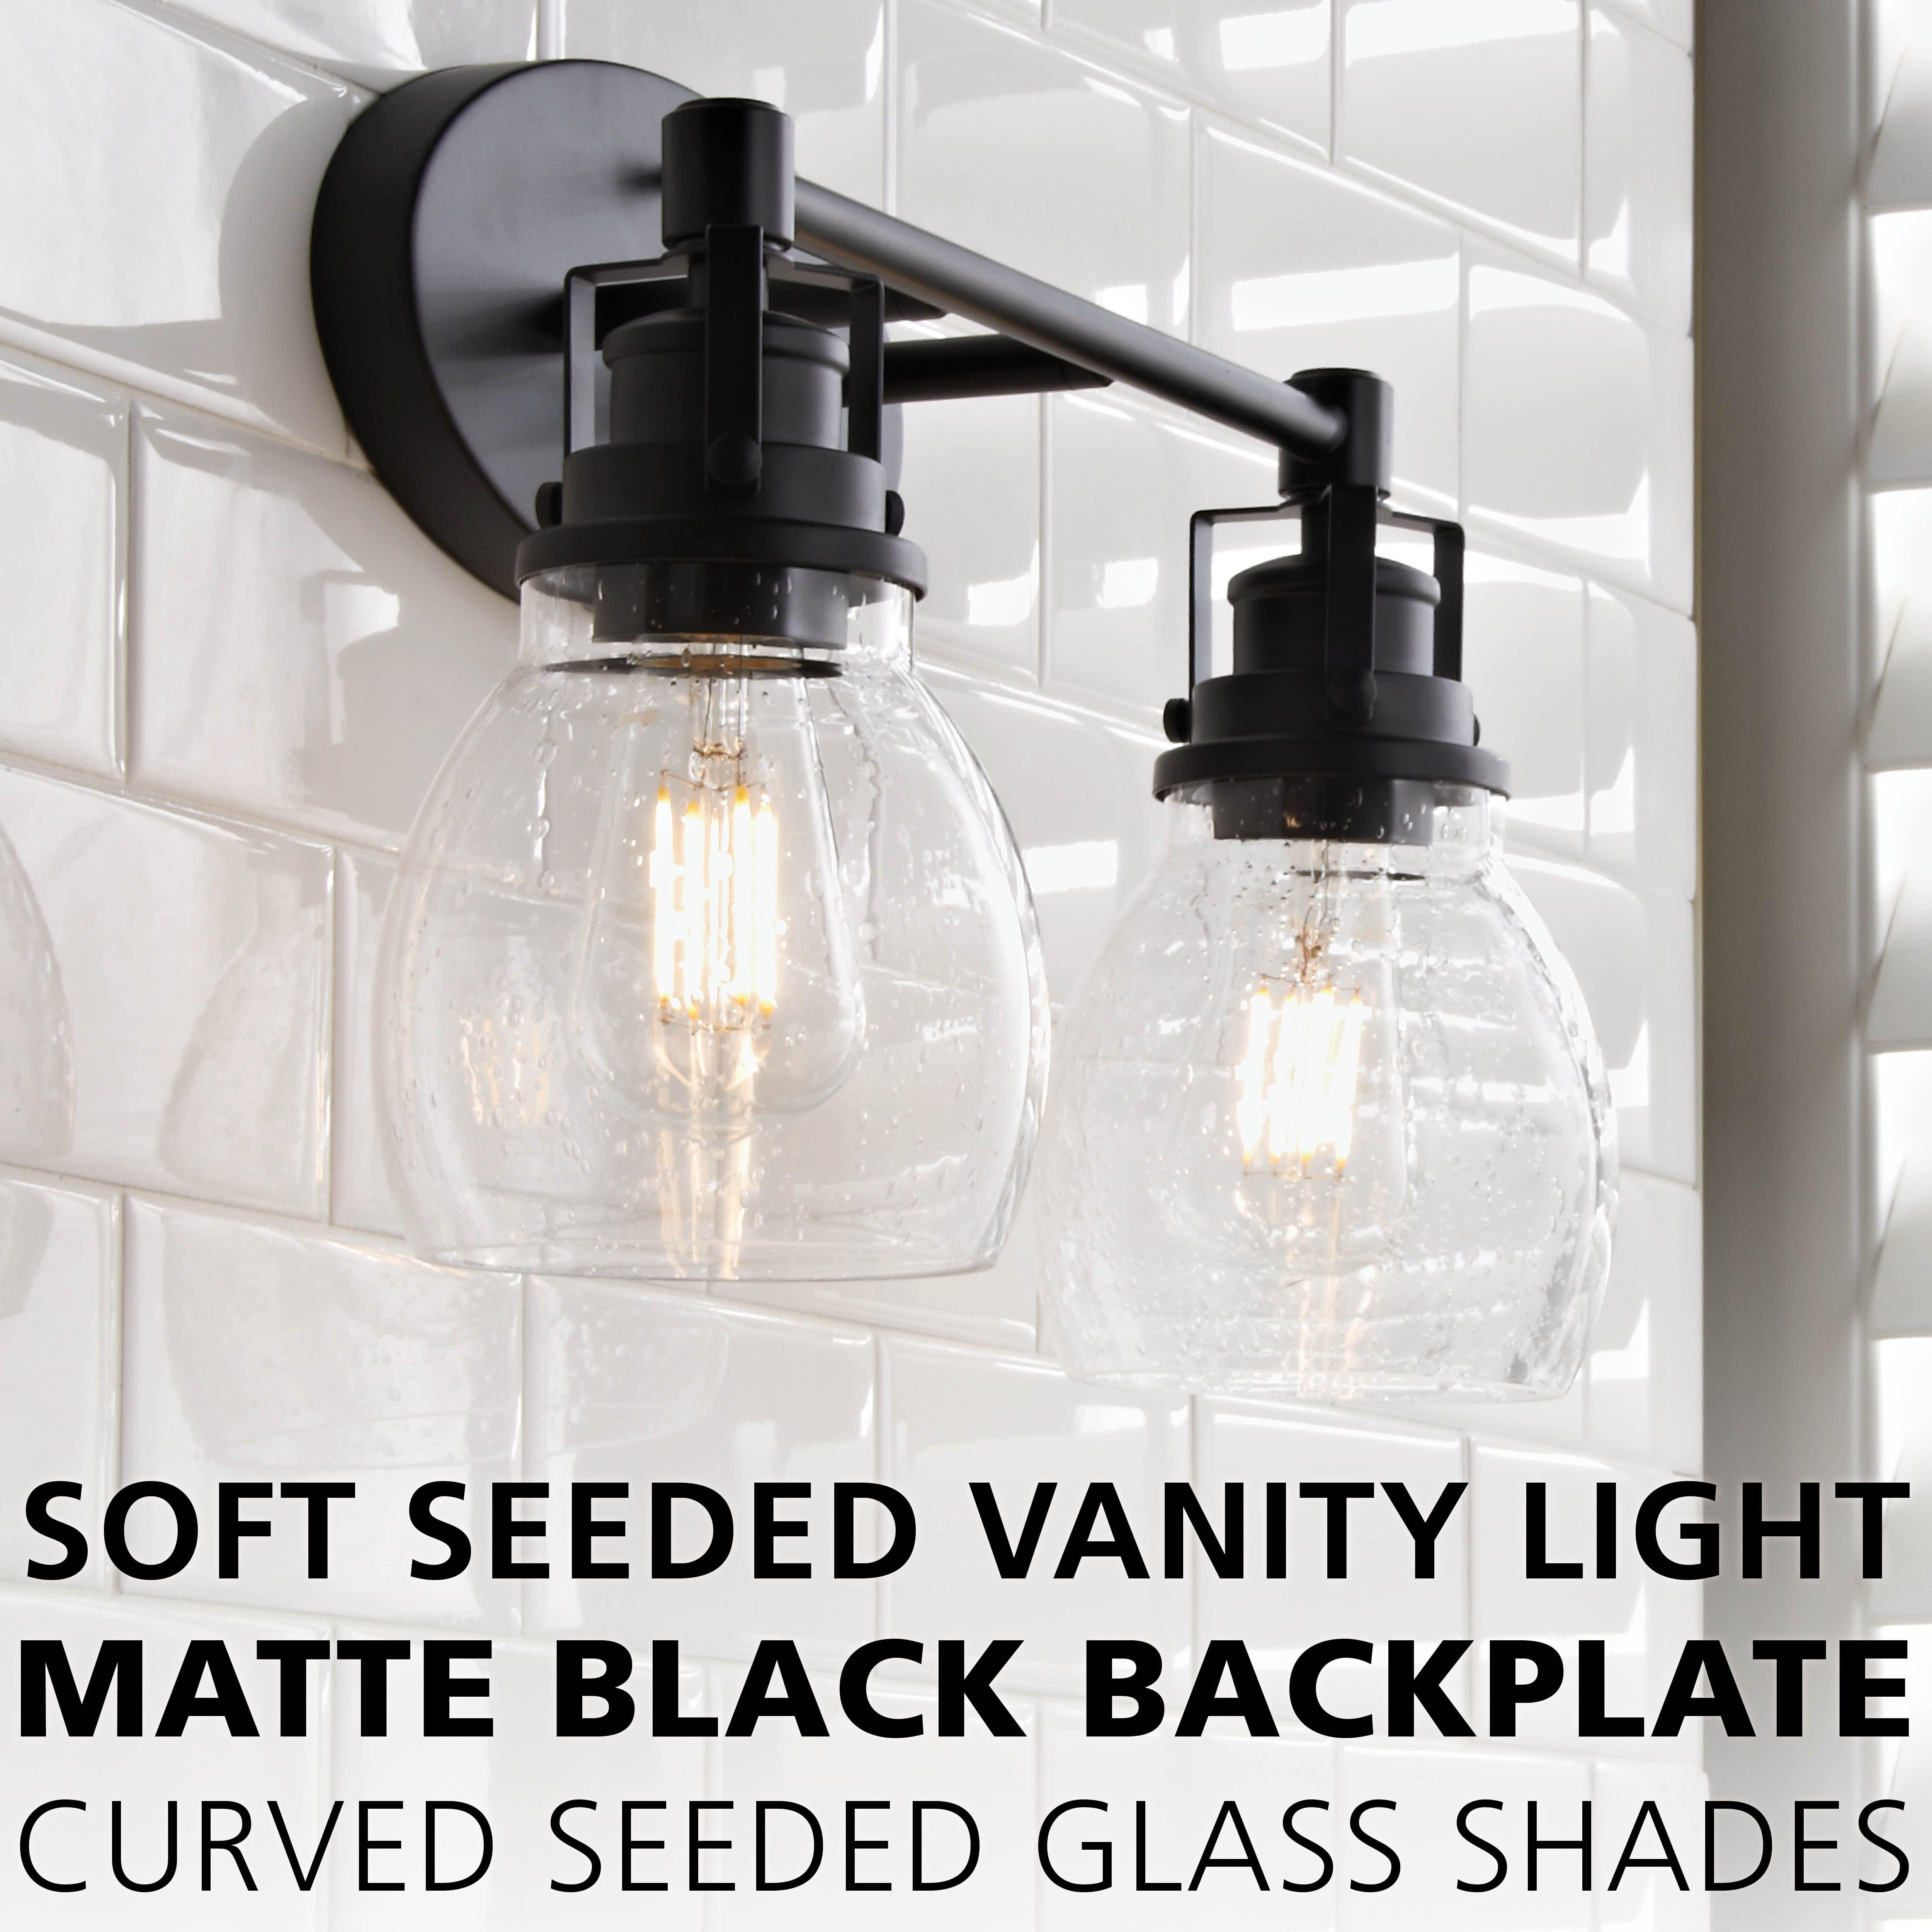 Soft Seeded Vanity Light 2 Light Vanity Lighting Bathroom Light Fixtures Black Bathroom